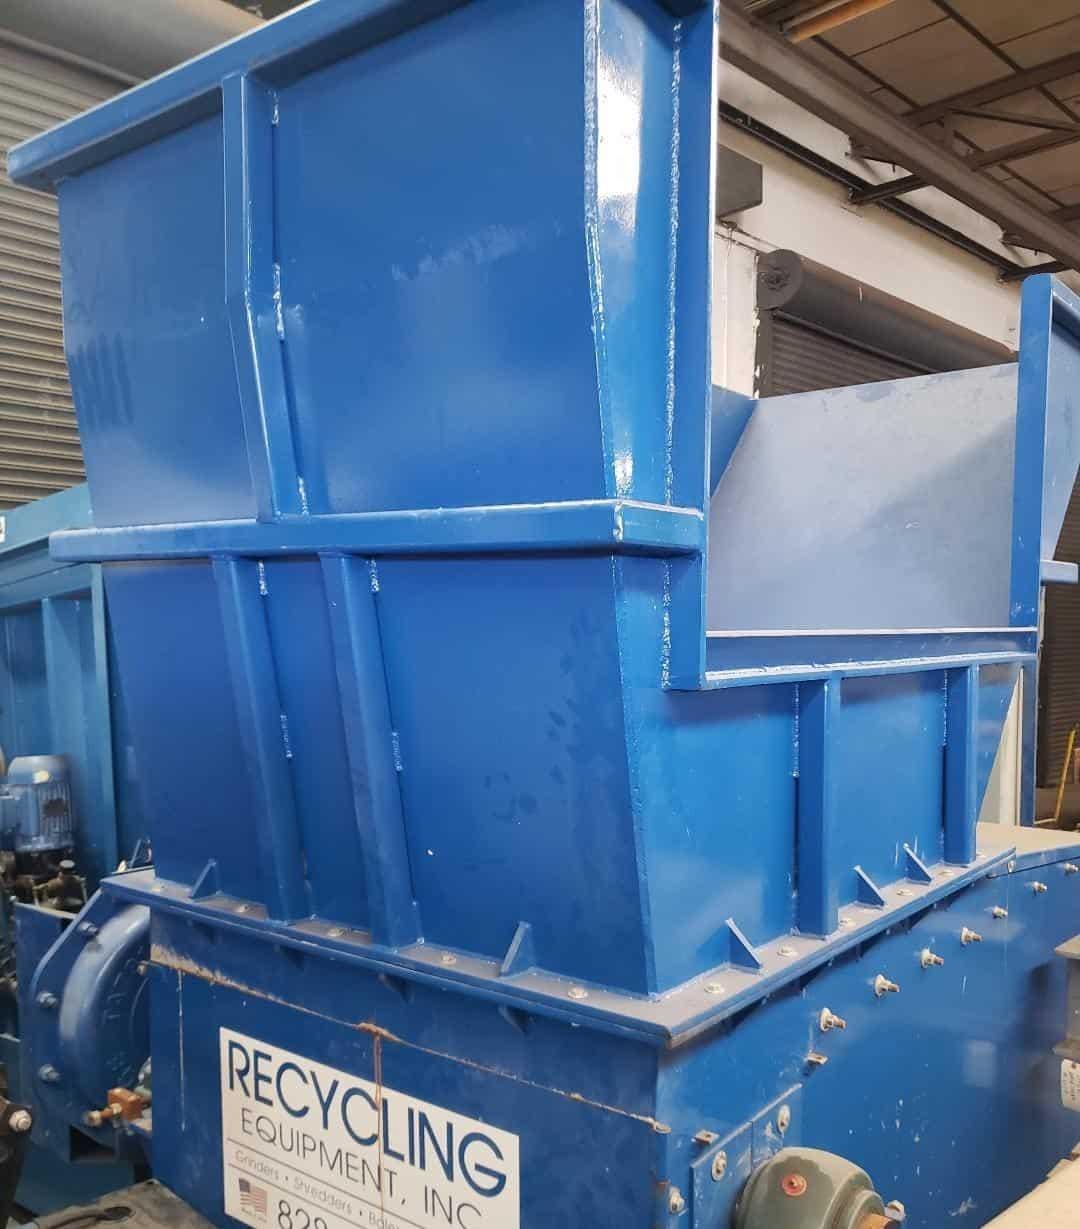 2006 Recycling Equipment Inc. P-42-60